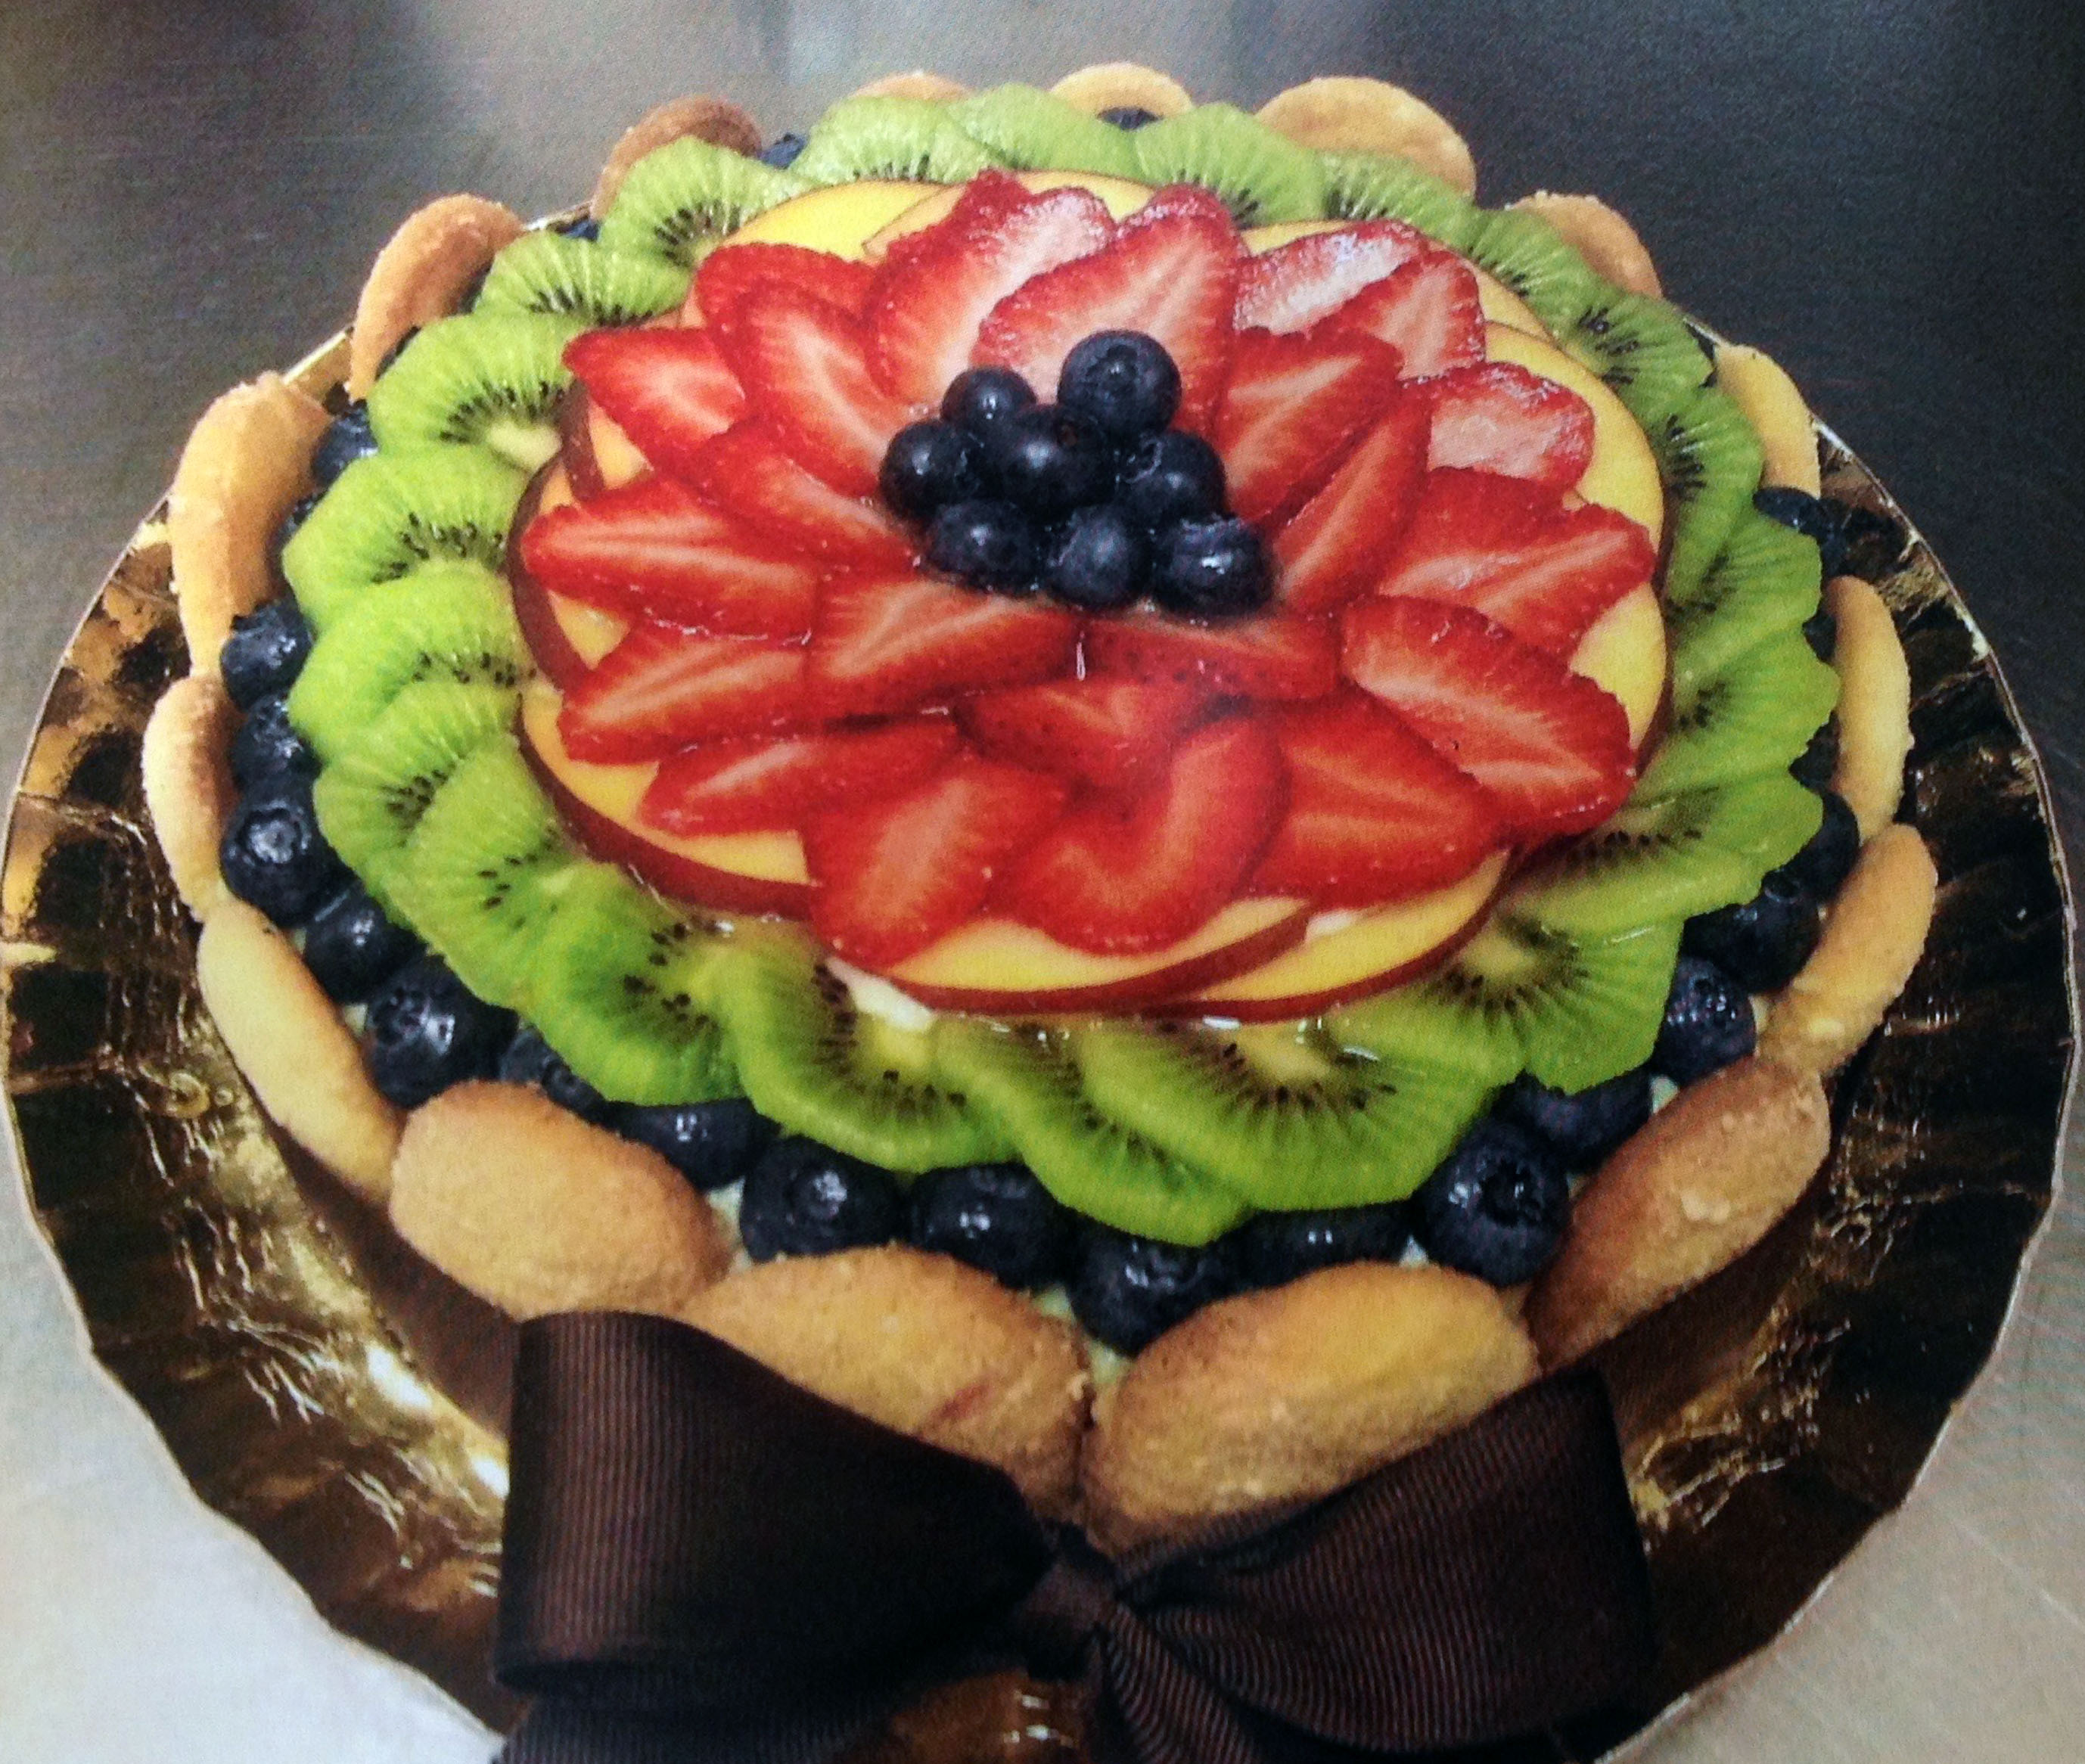 Delicious gluten free tart